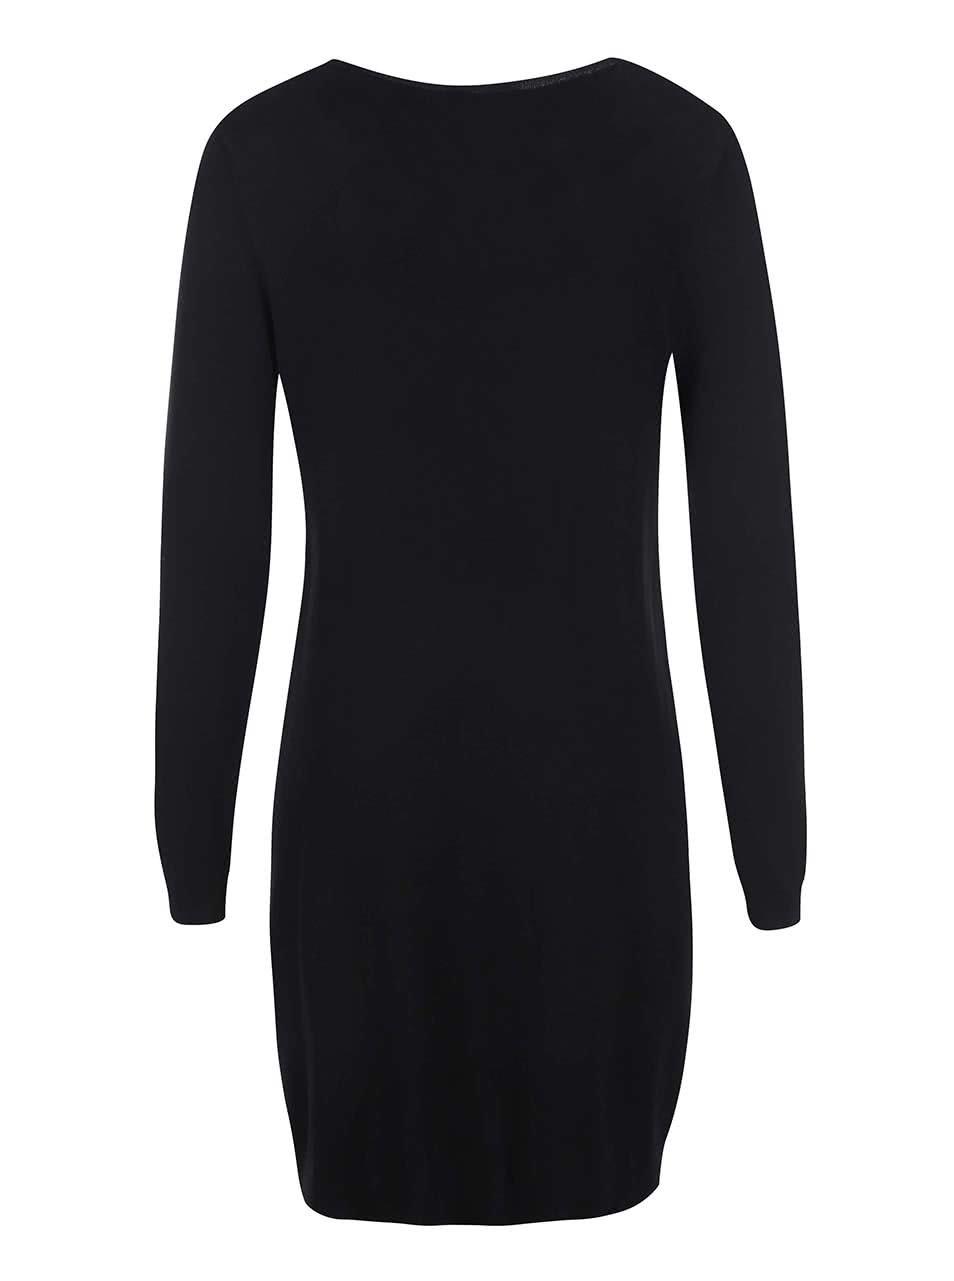 9f99b3ac5ed8 Čierne pletené šaty s vreckami Dorothy Perkins ...